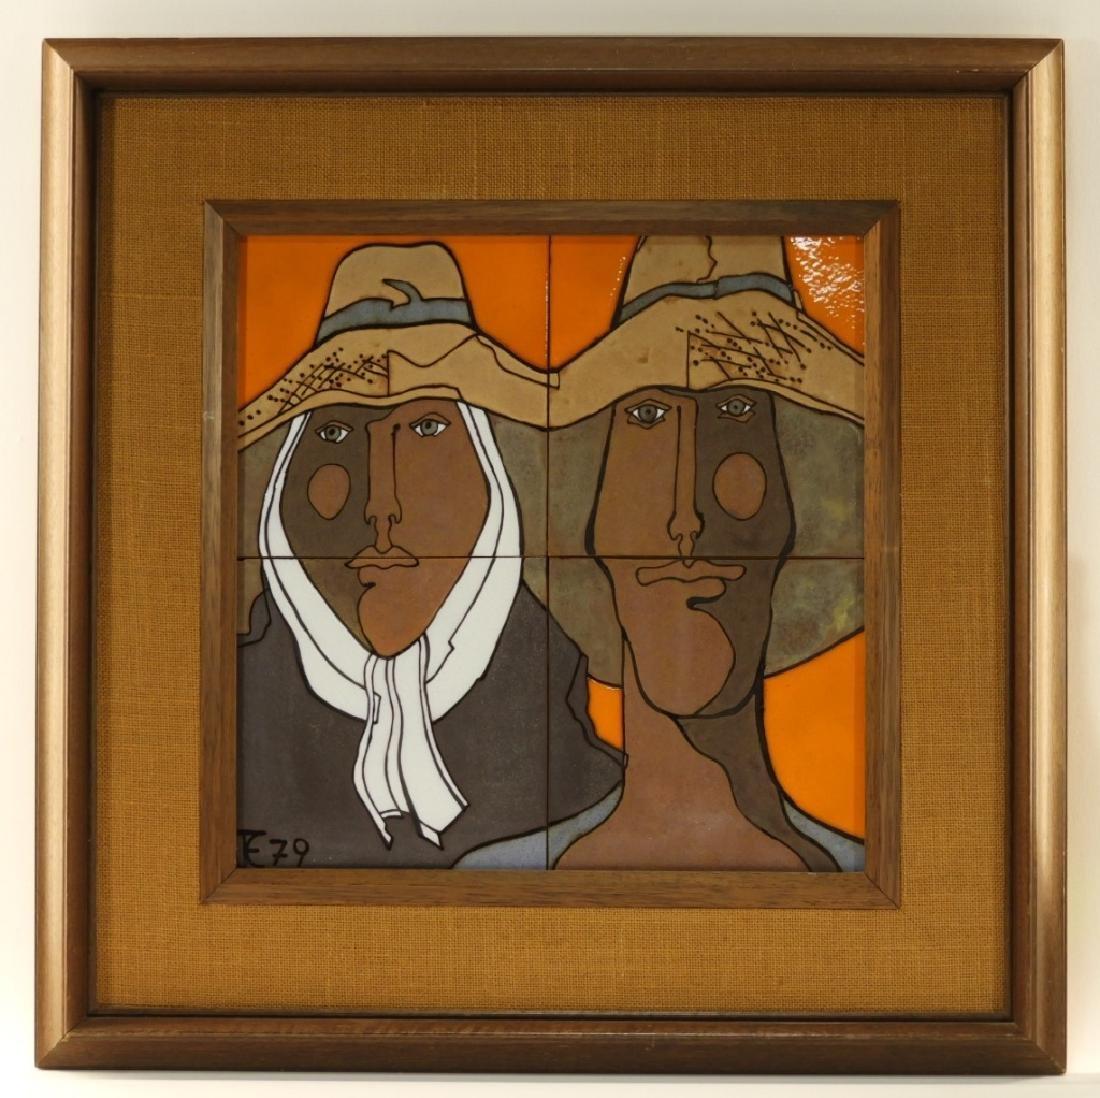 Mexican Modernist Figurative Ceramic Portrait Tile